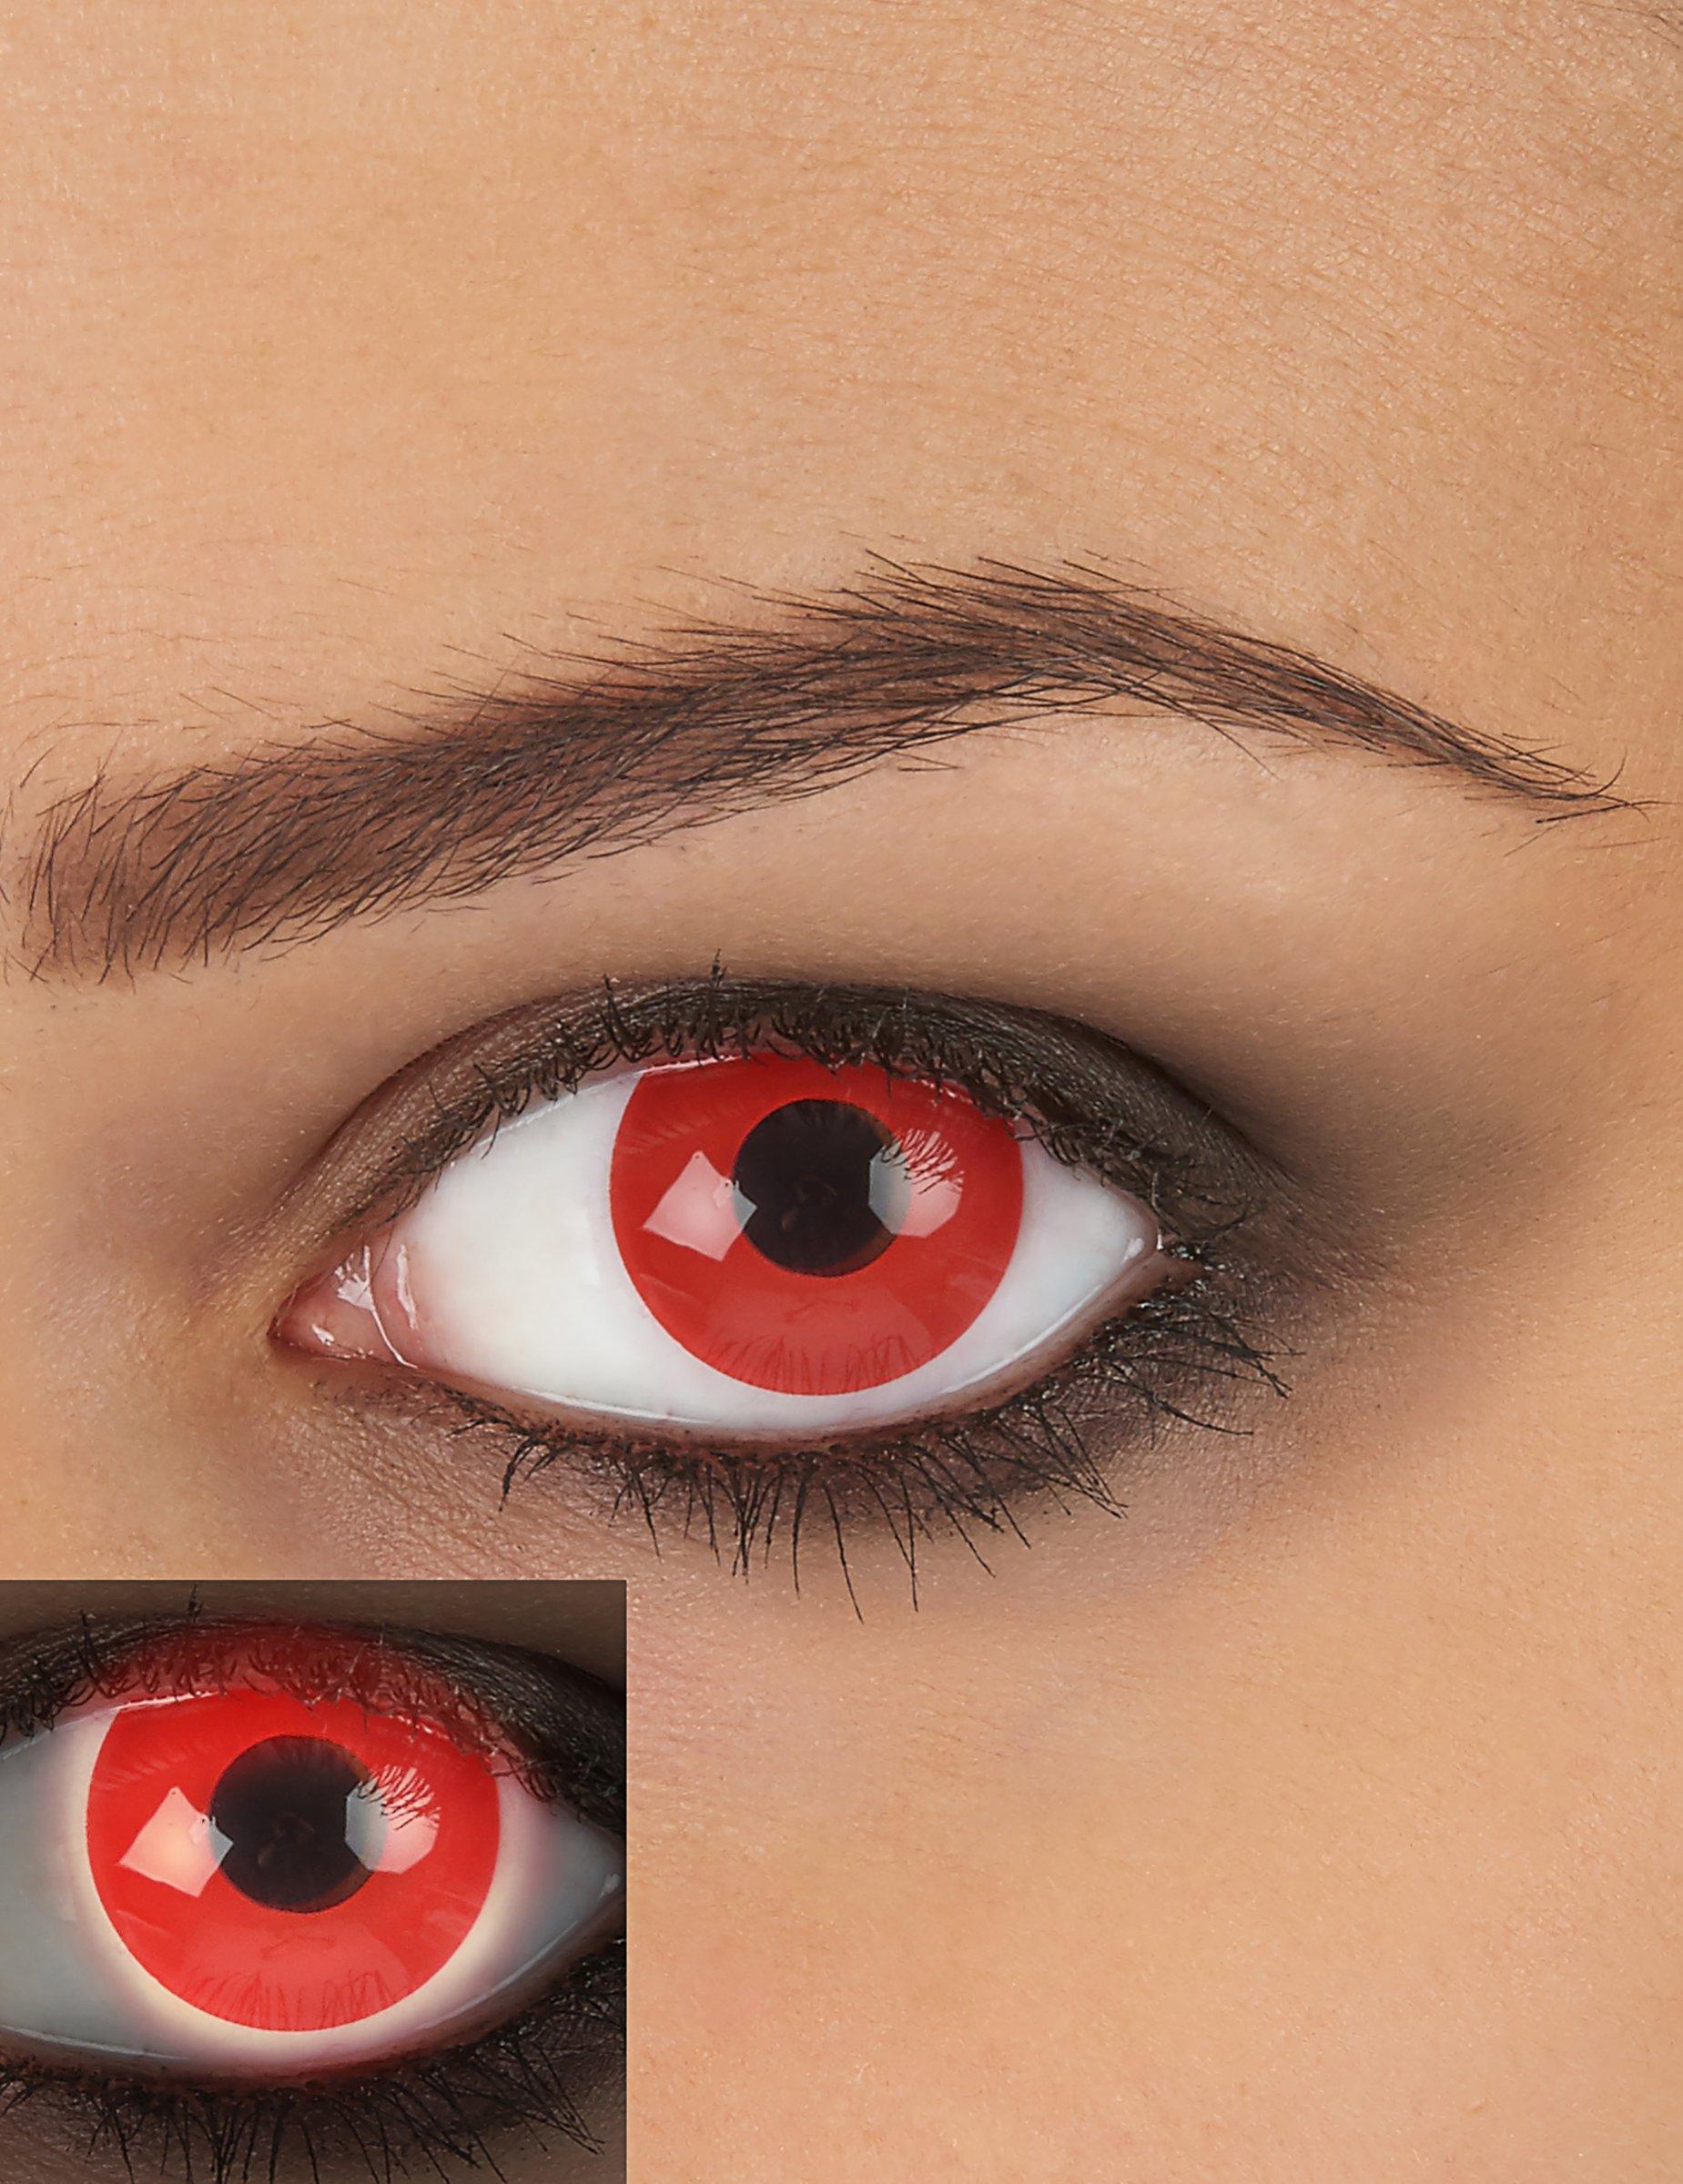 Kontaktlinsen blutrot 14,5mm 82906